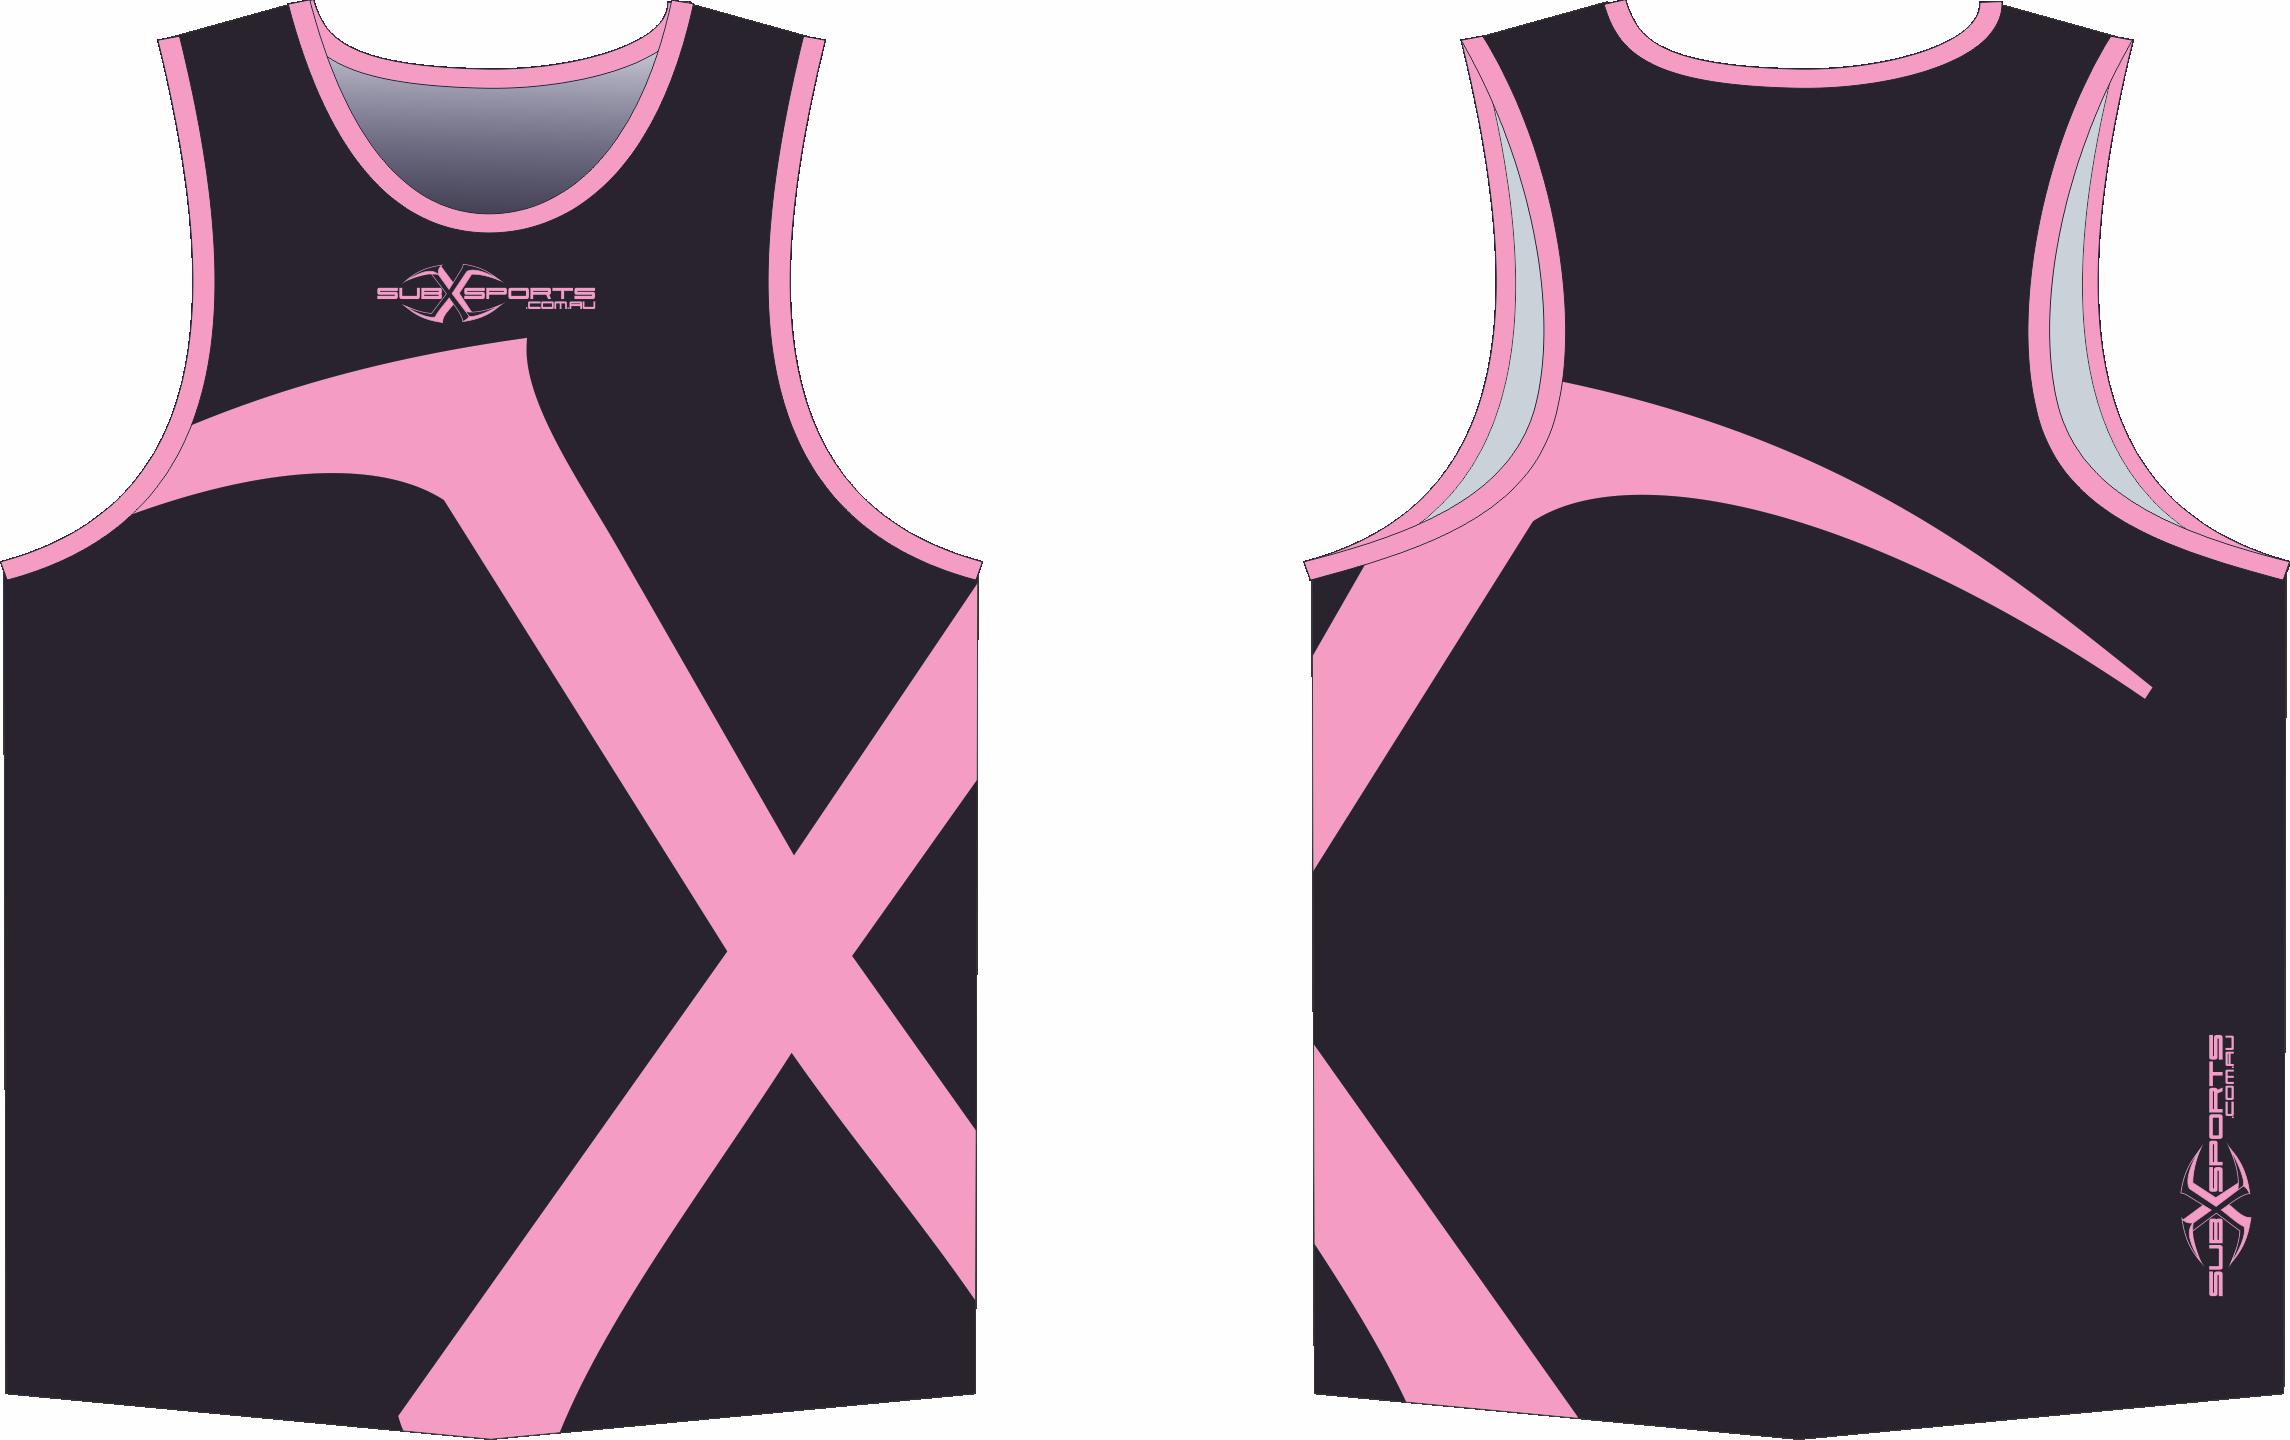 X301XS Black Pink Singlet.png